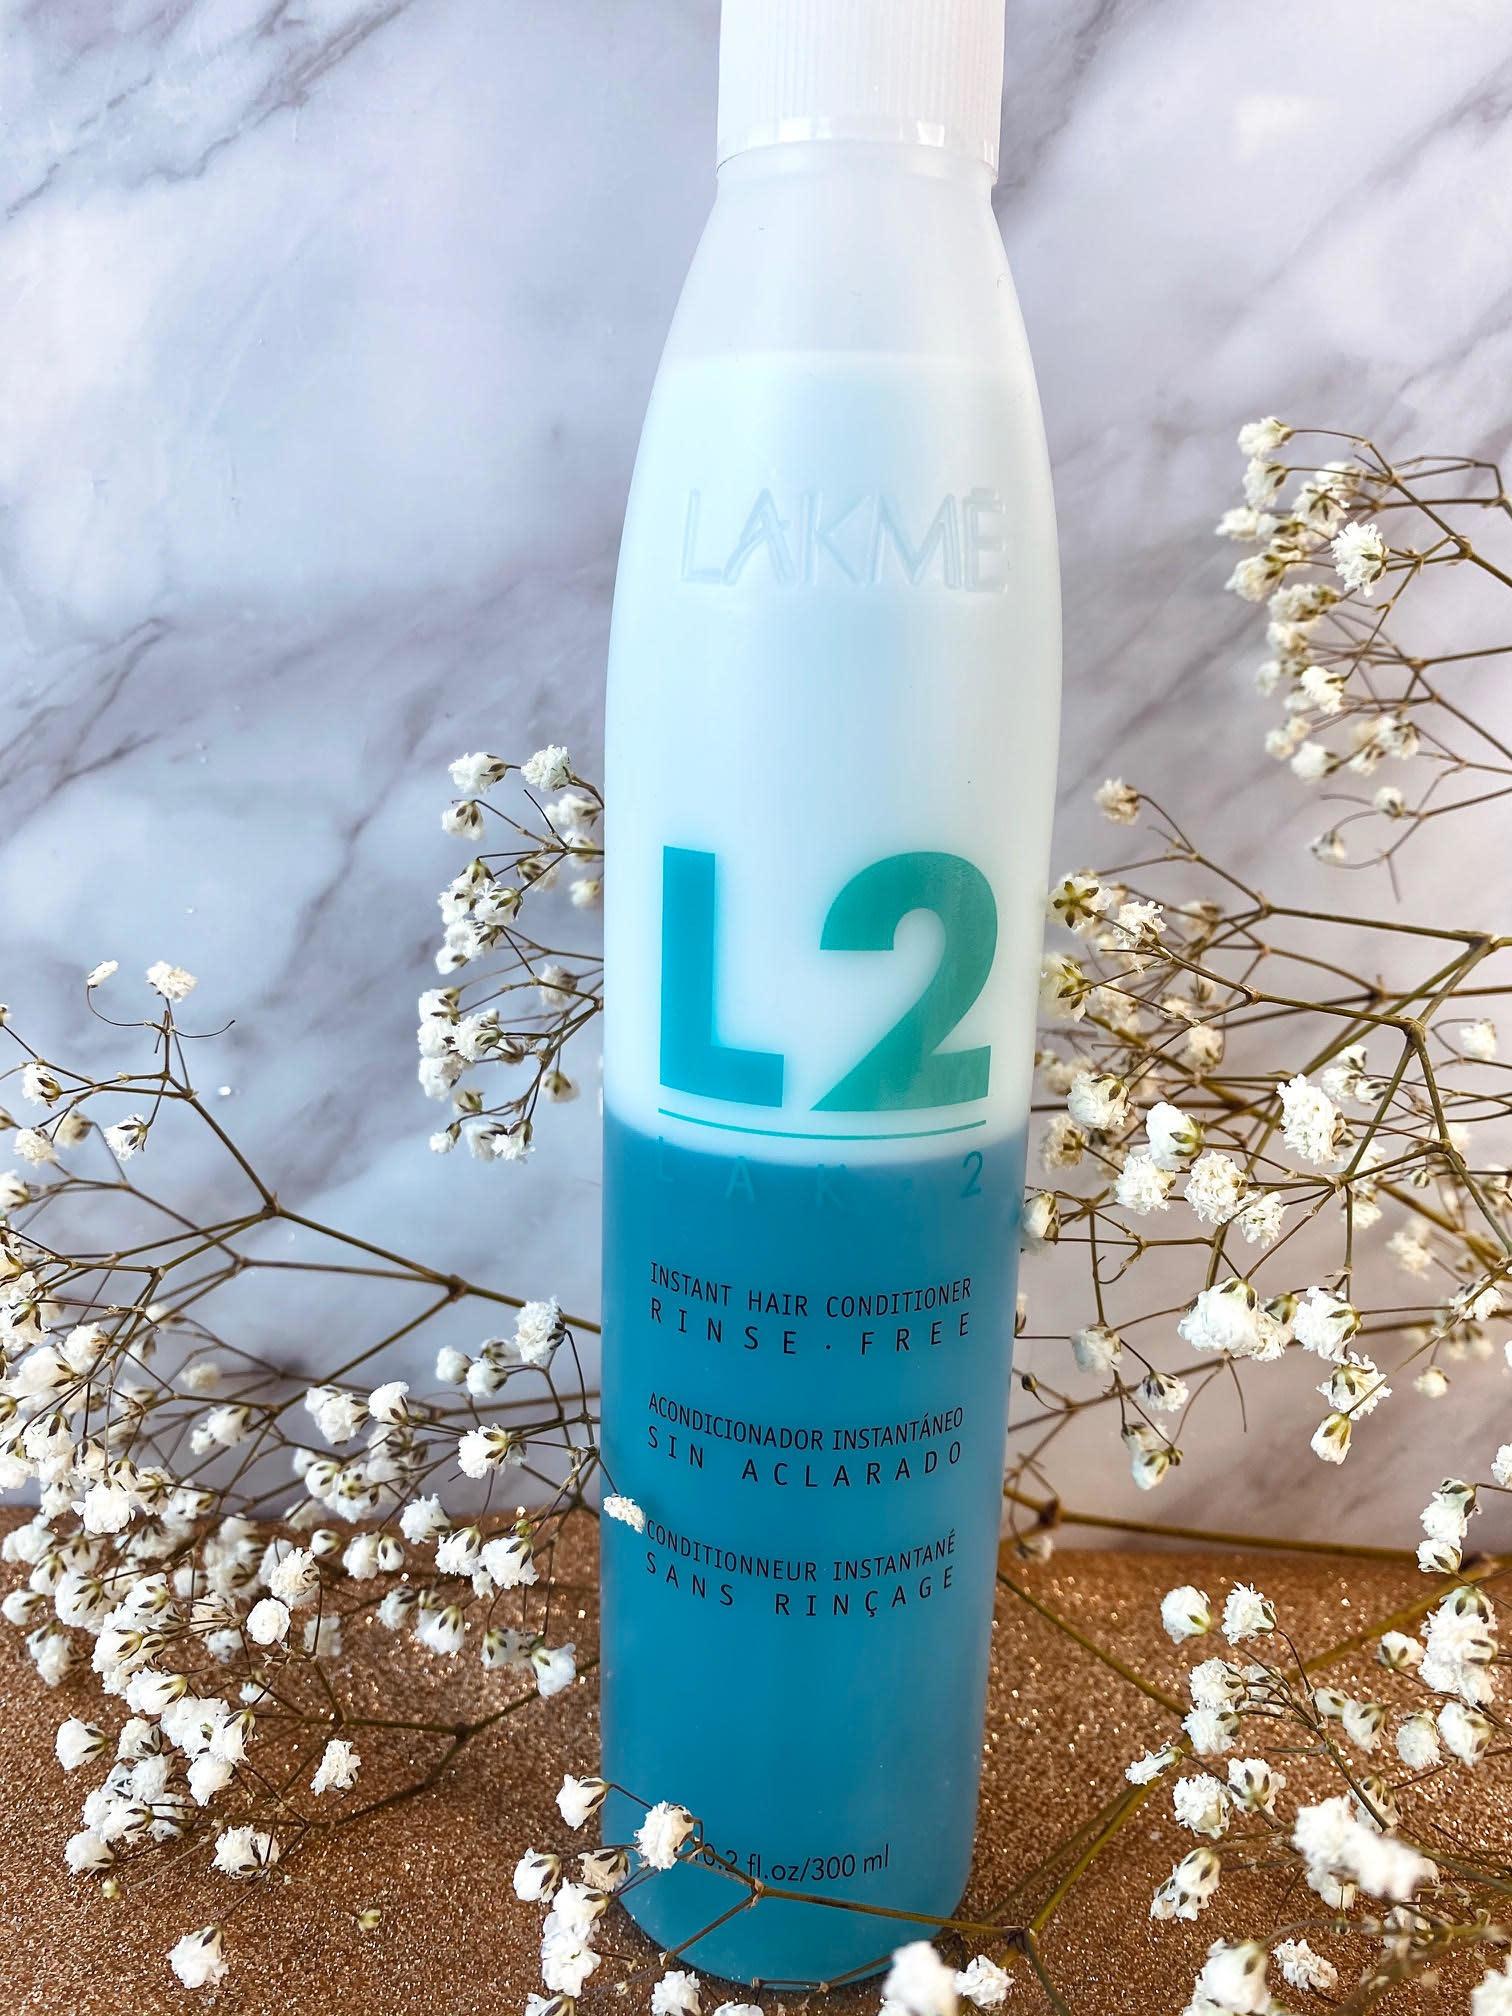 Lakmé Lak-2 300ml